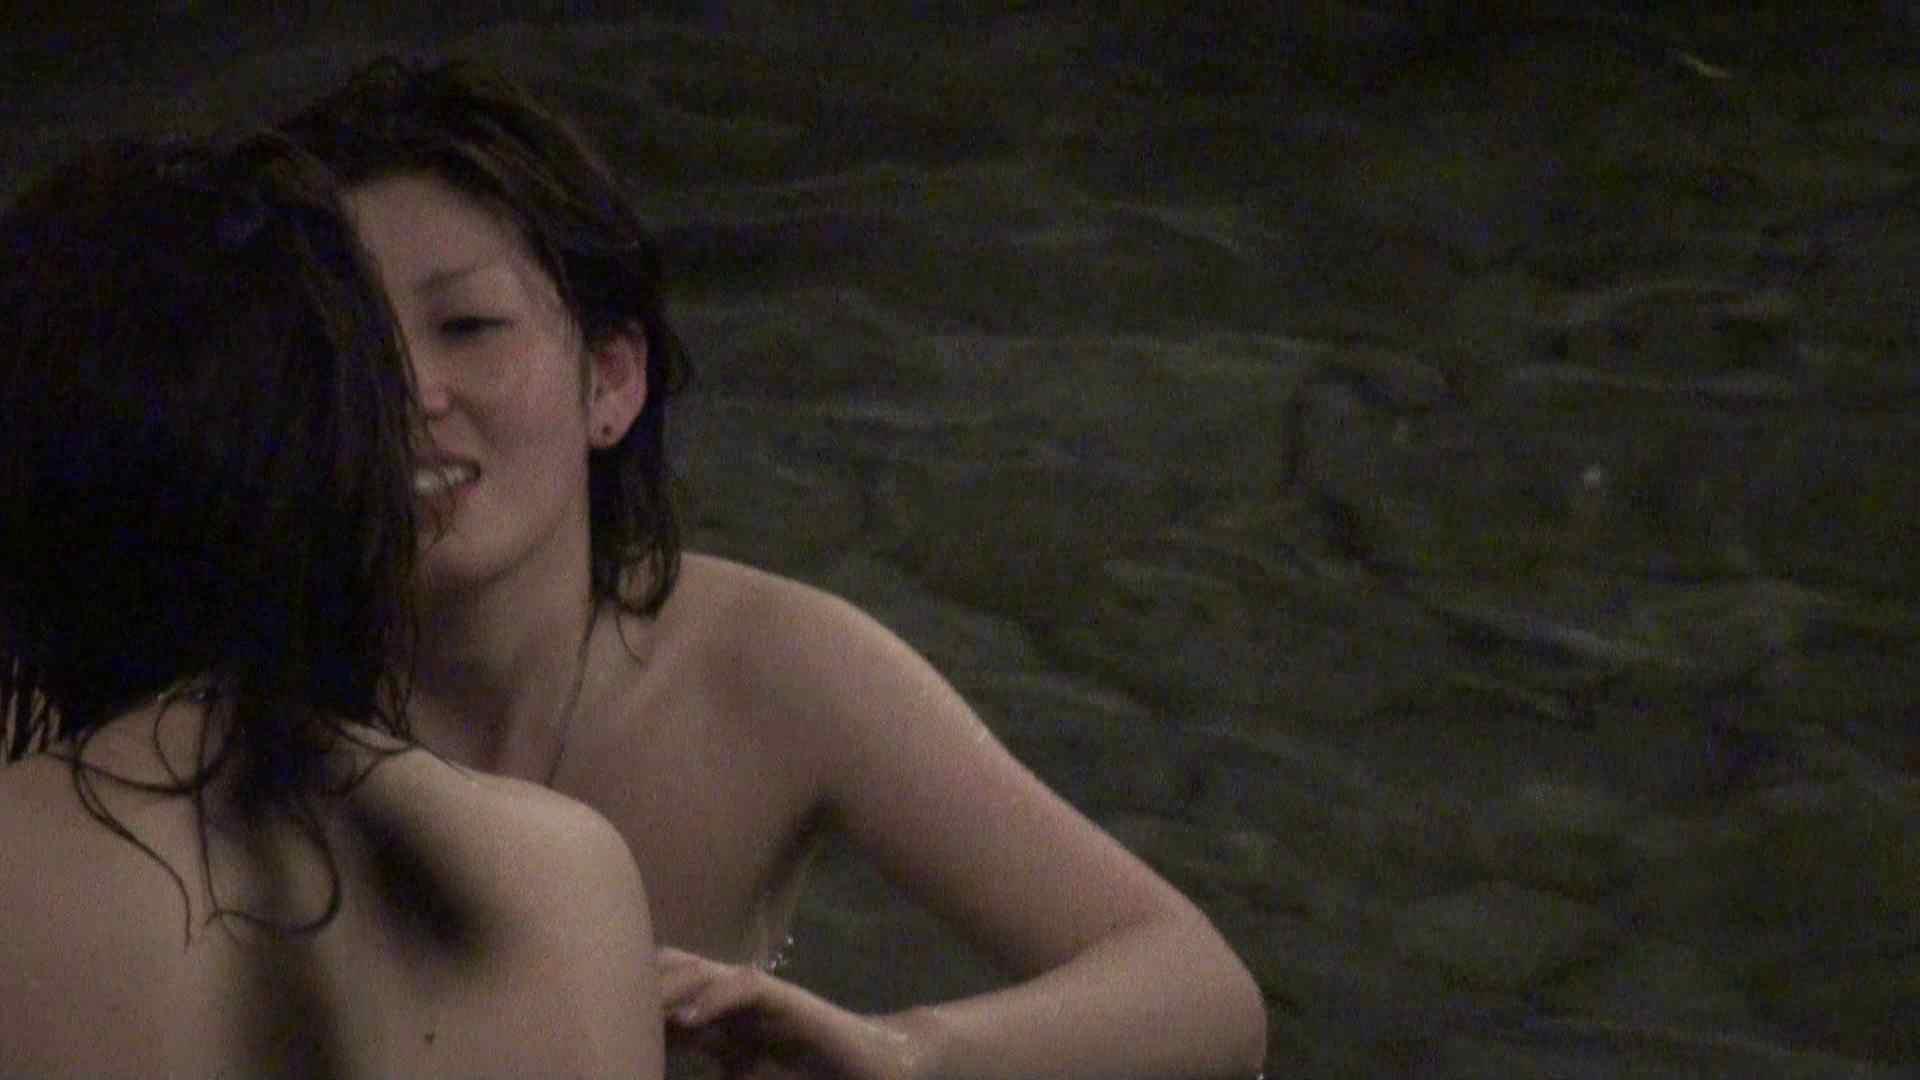 Aquaな露天風呂Vol.376 OLのエロ生活 | 露天風呂  109連発 49